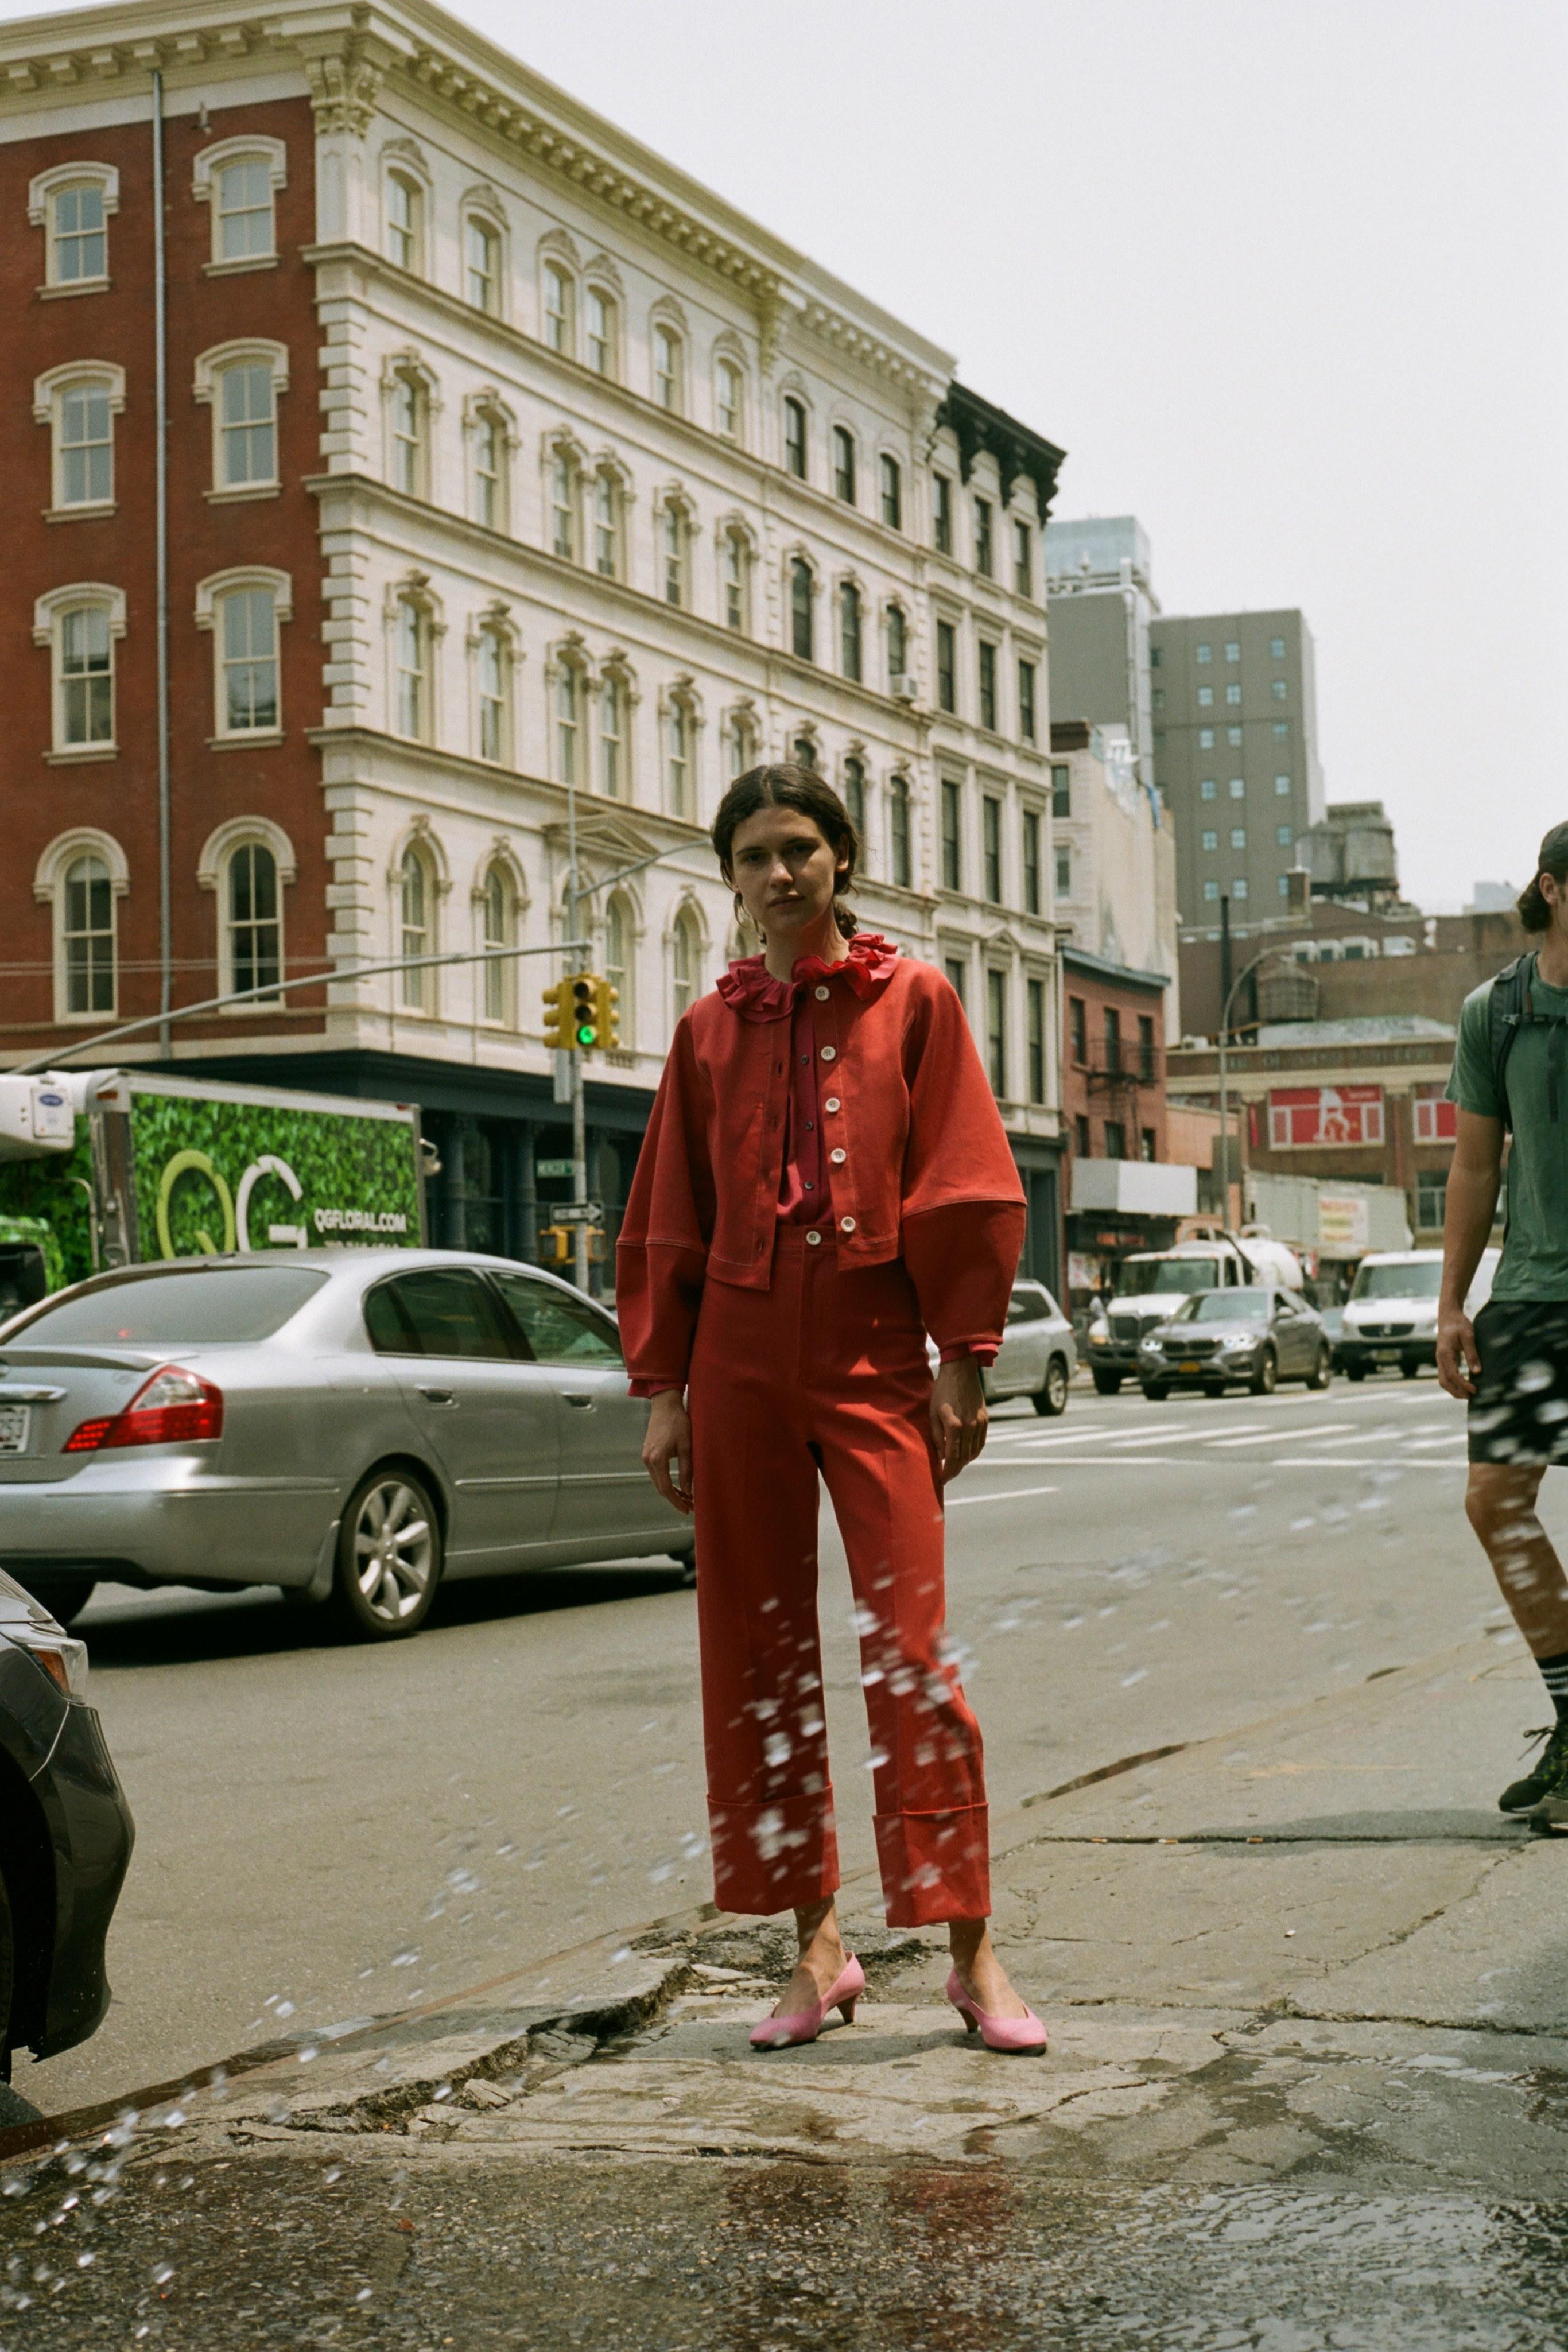 Corbin color denim jacket, Sinclair ruffle blouse, Corbin color denim cuff pant